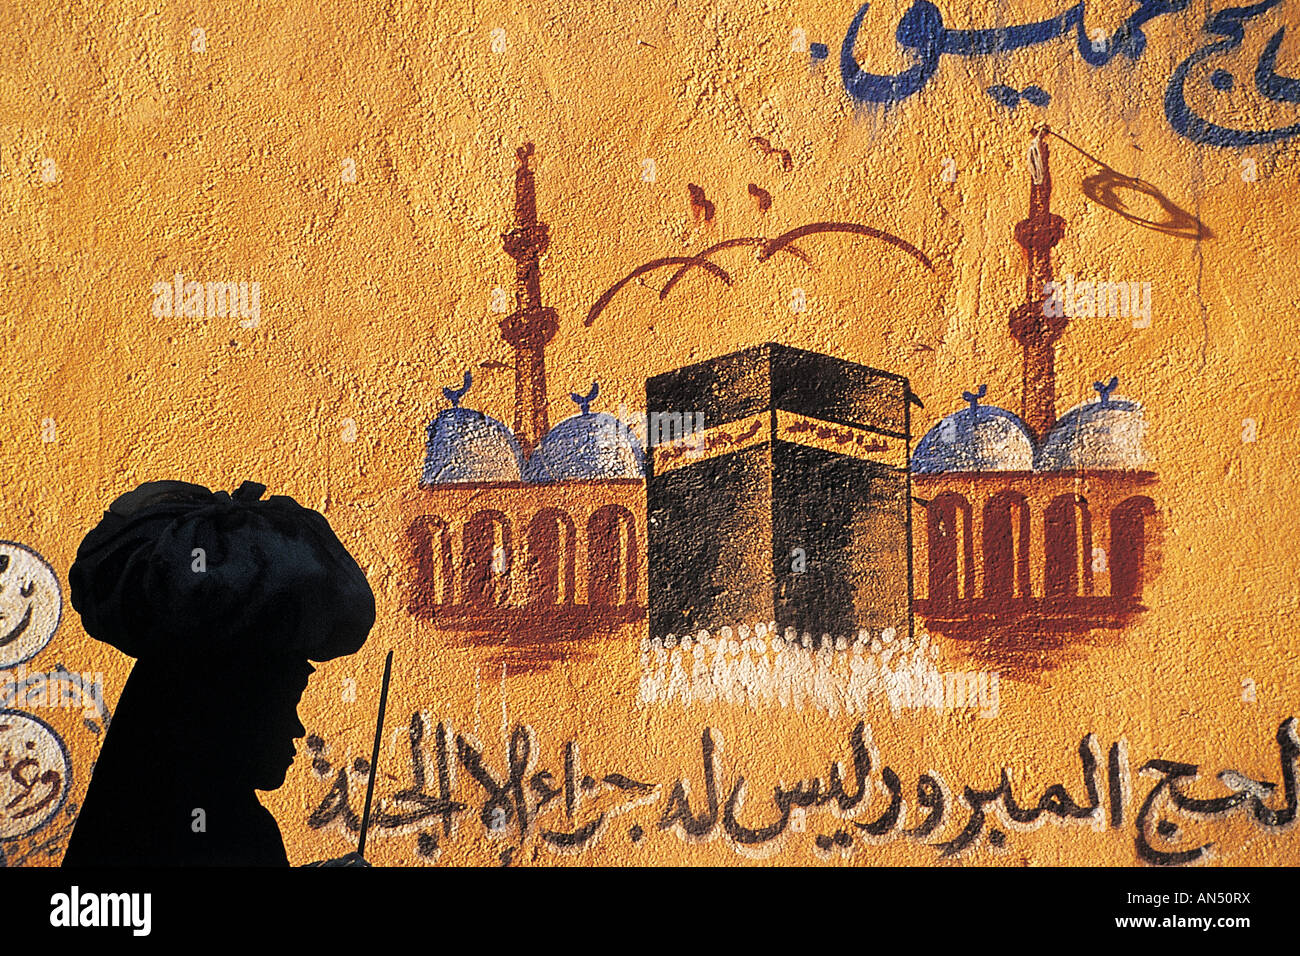 Kaaba Gemälde an der Wand, Alt Kairo. Stockbild